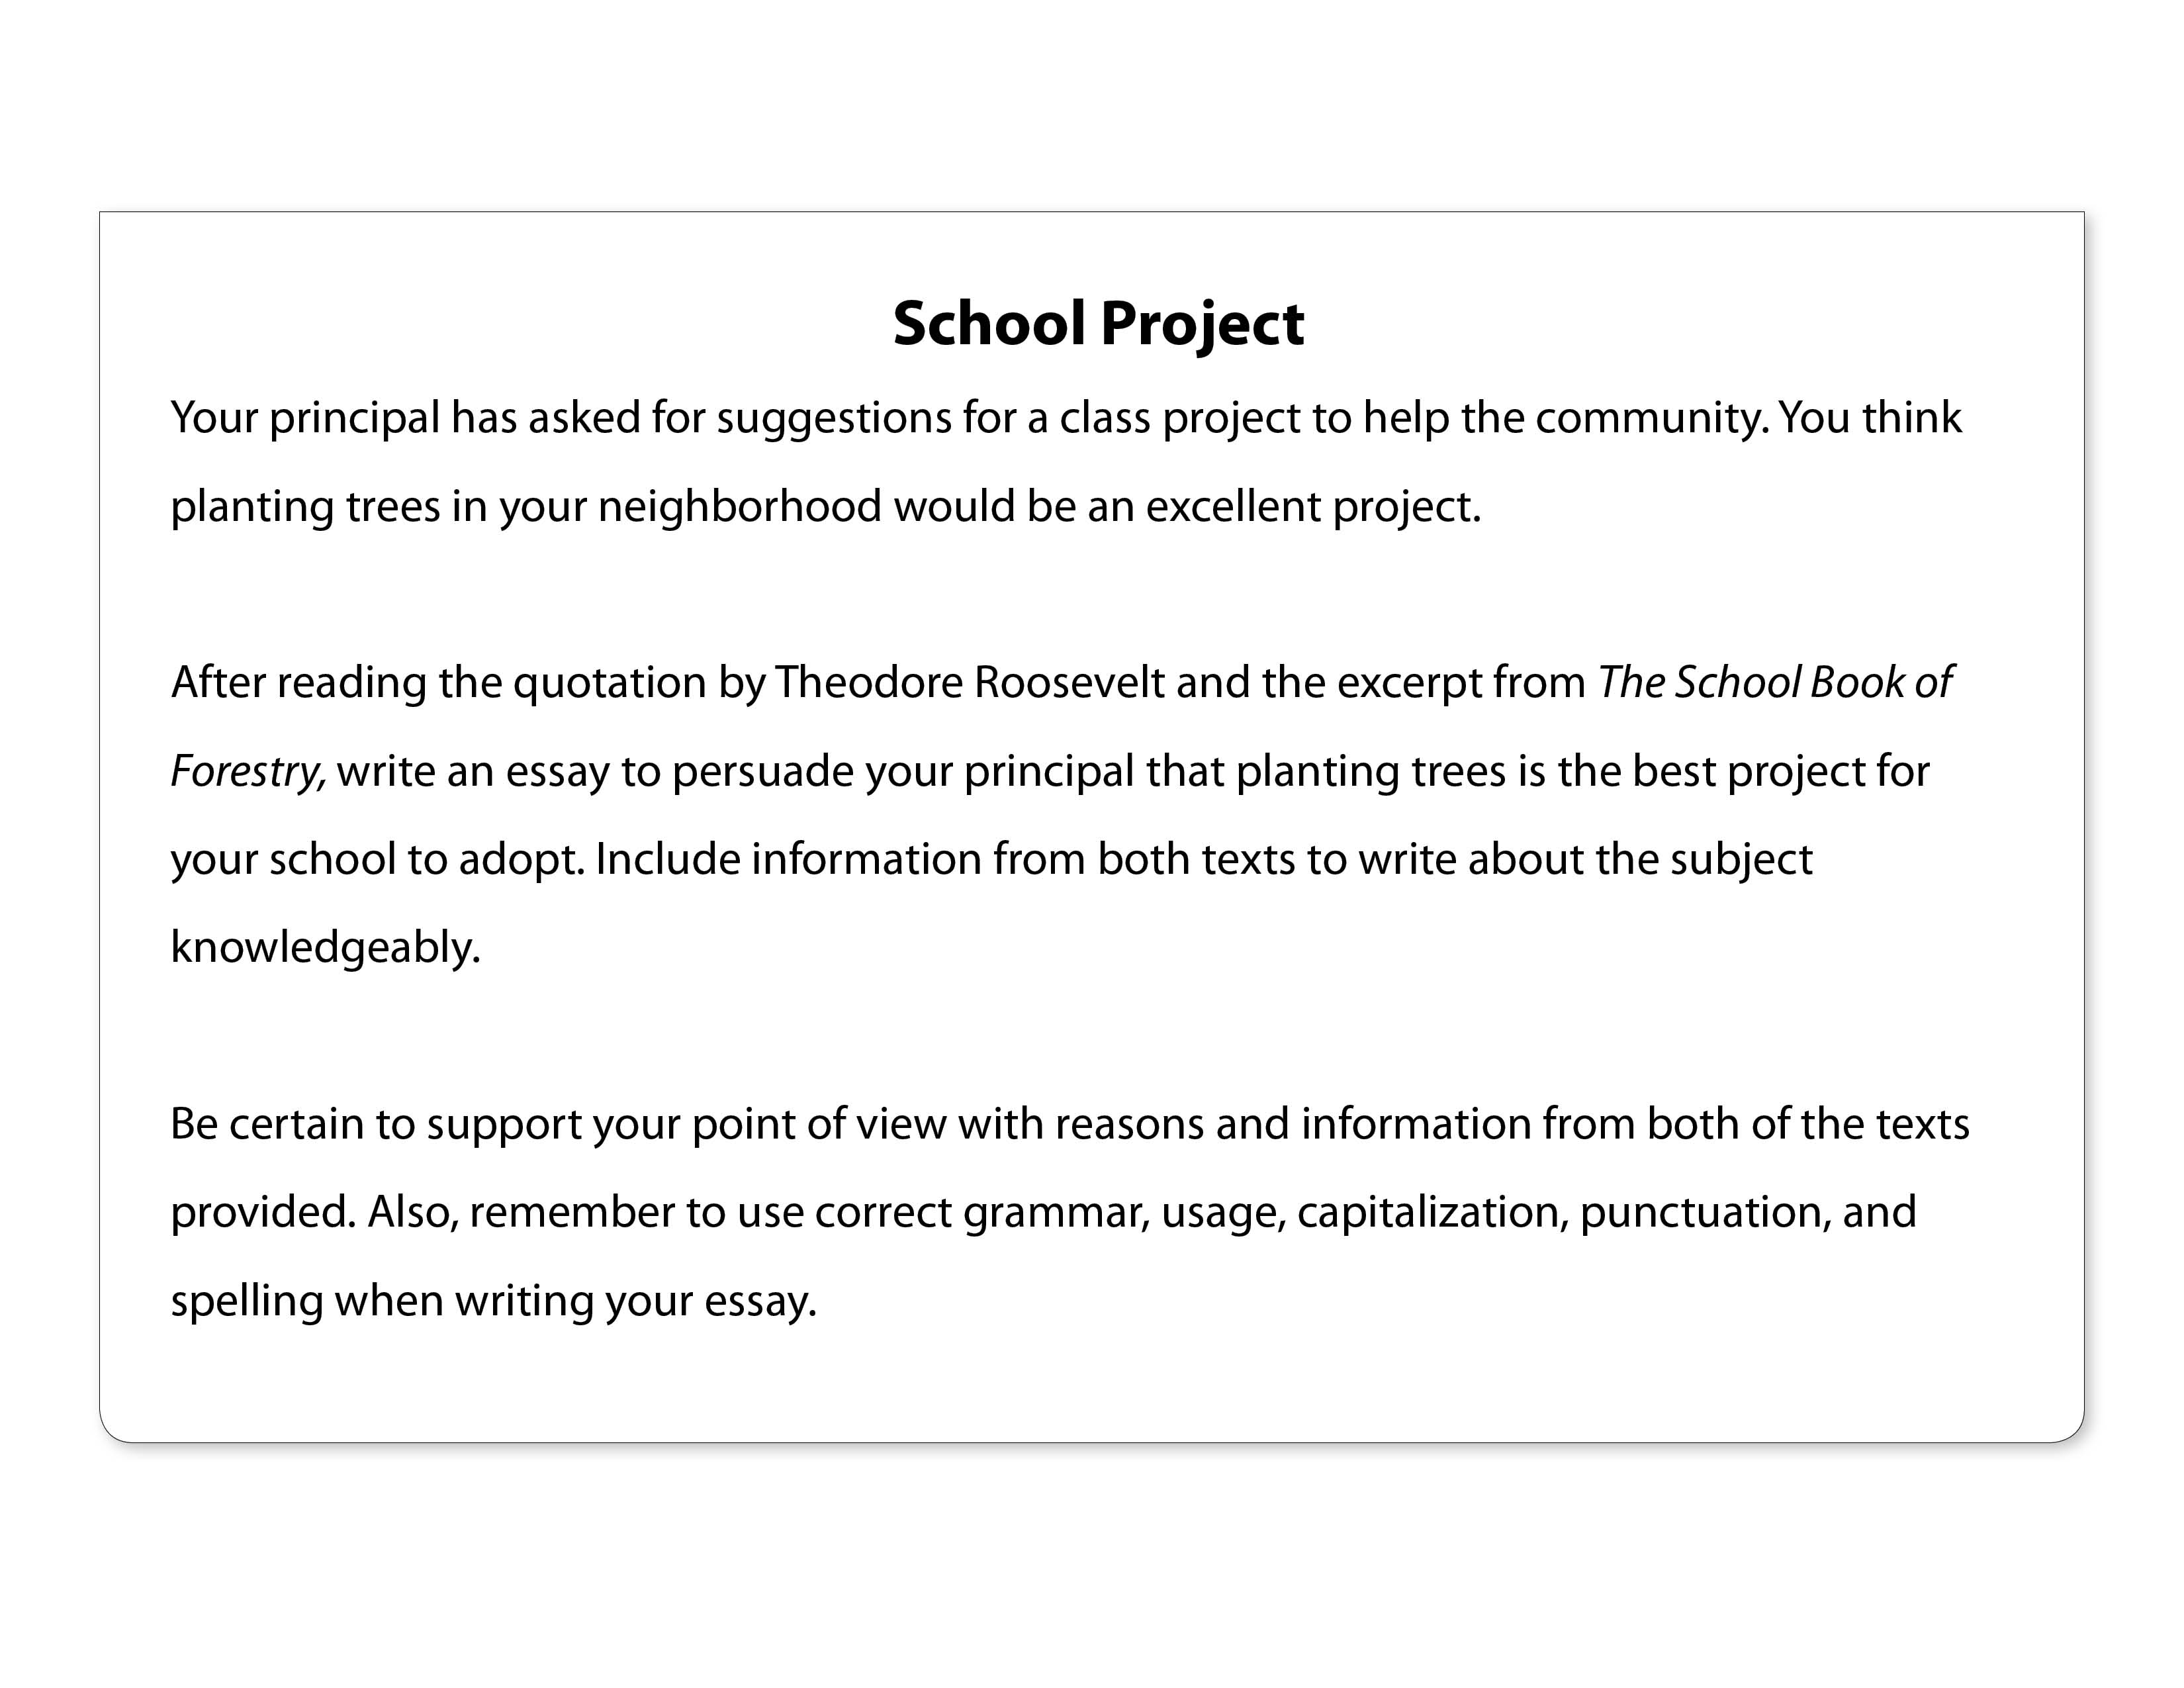 018 Essay Example Reword Faq  School Project Original Jpeg Amazing Generator FreeFull